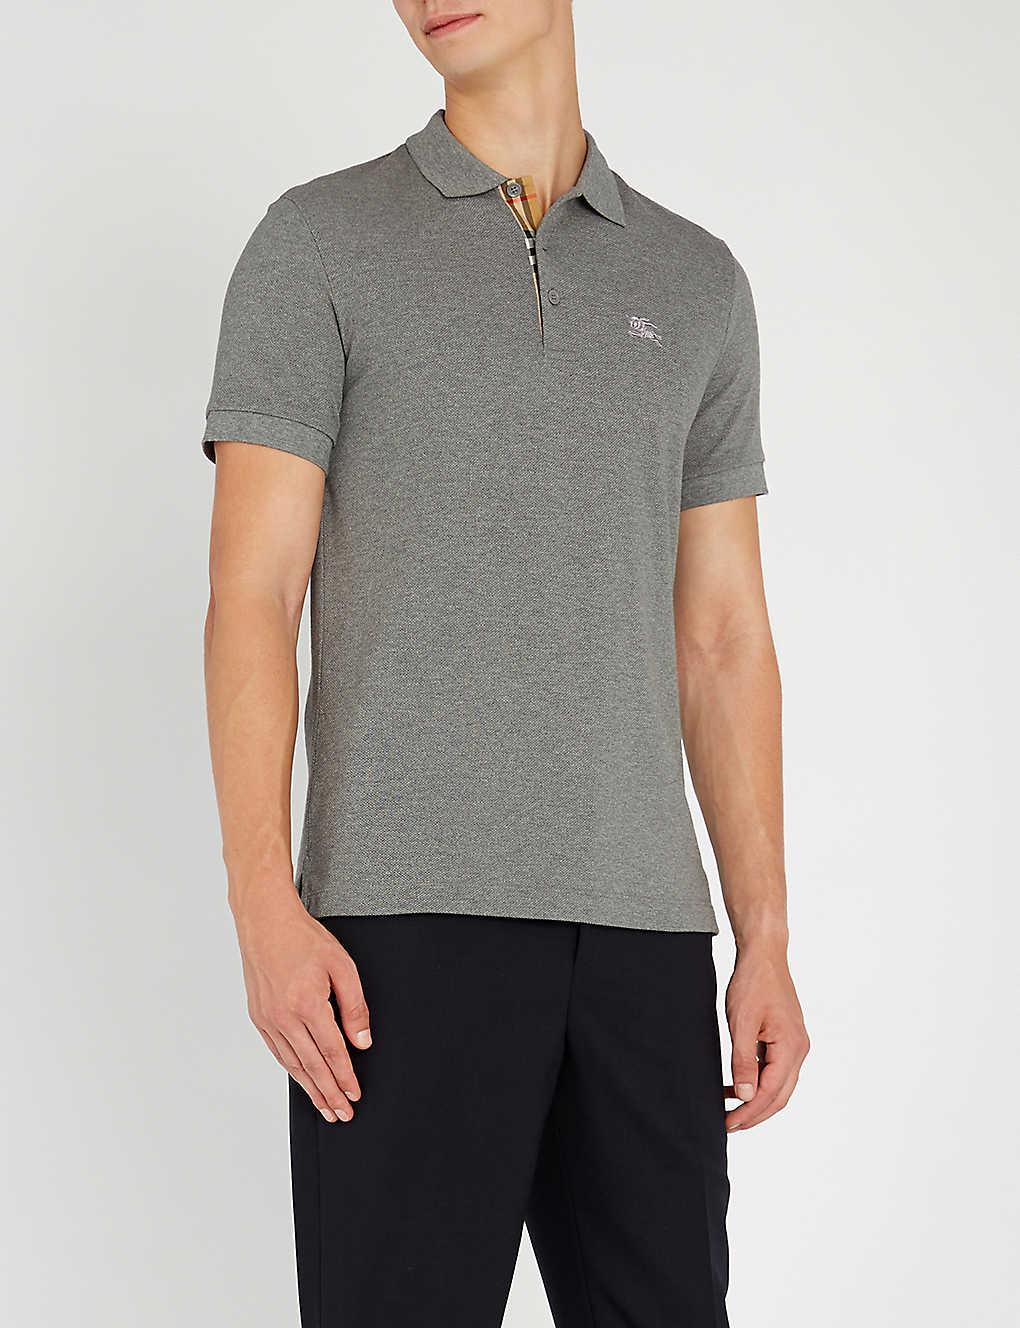 65e7cf61 BURBERRY - Hartford checked cotton-piqué polo shirt | Selfridges.com